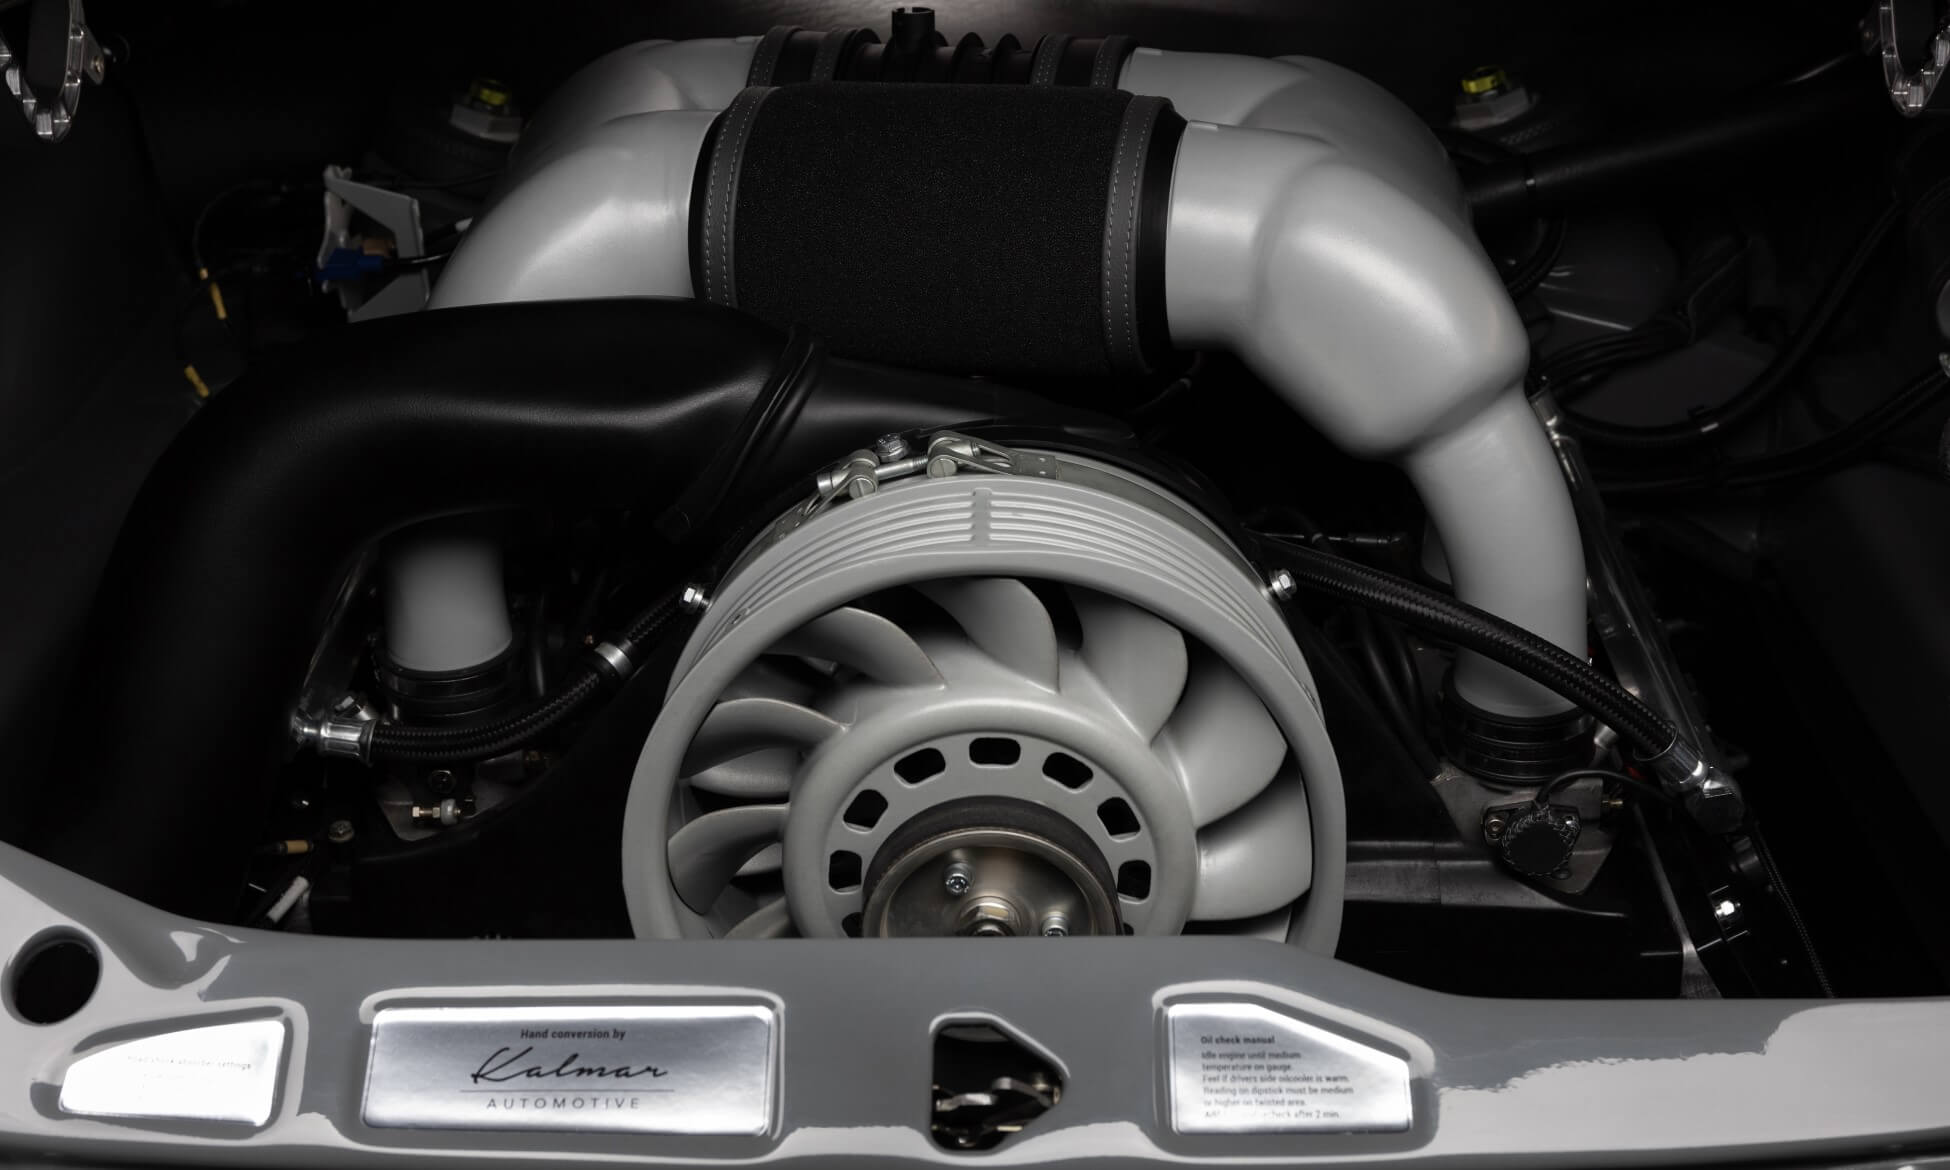 Kalmar Automotive Porsche 797 engine